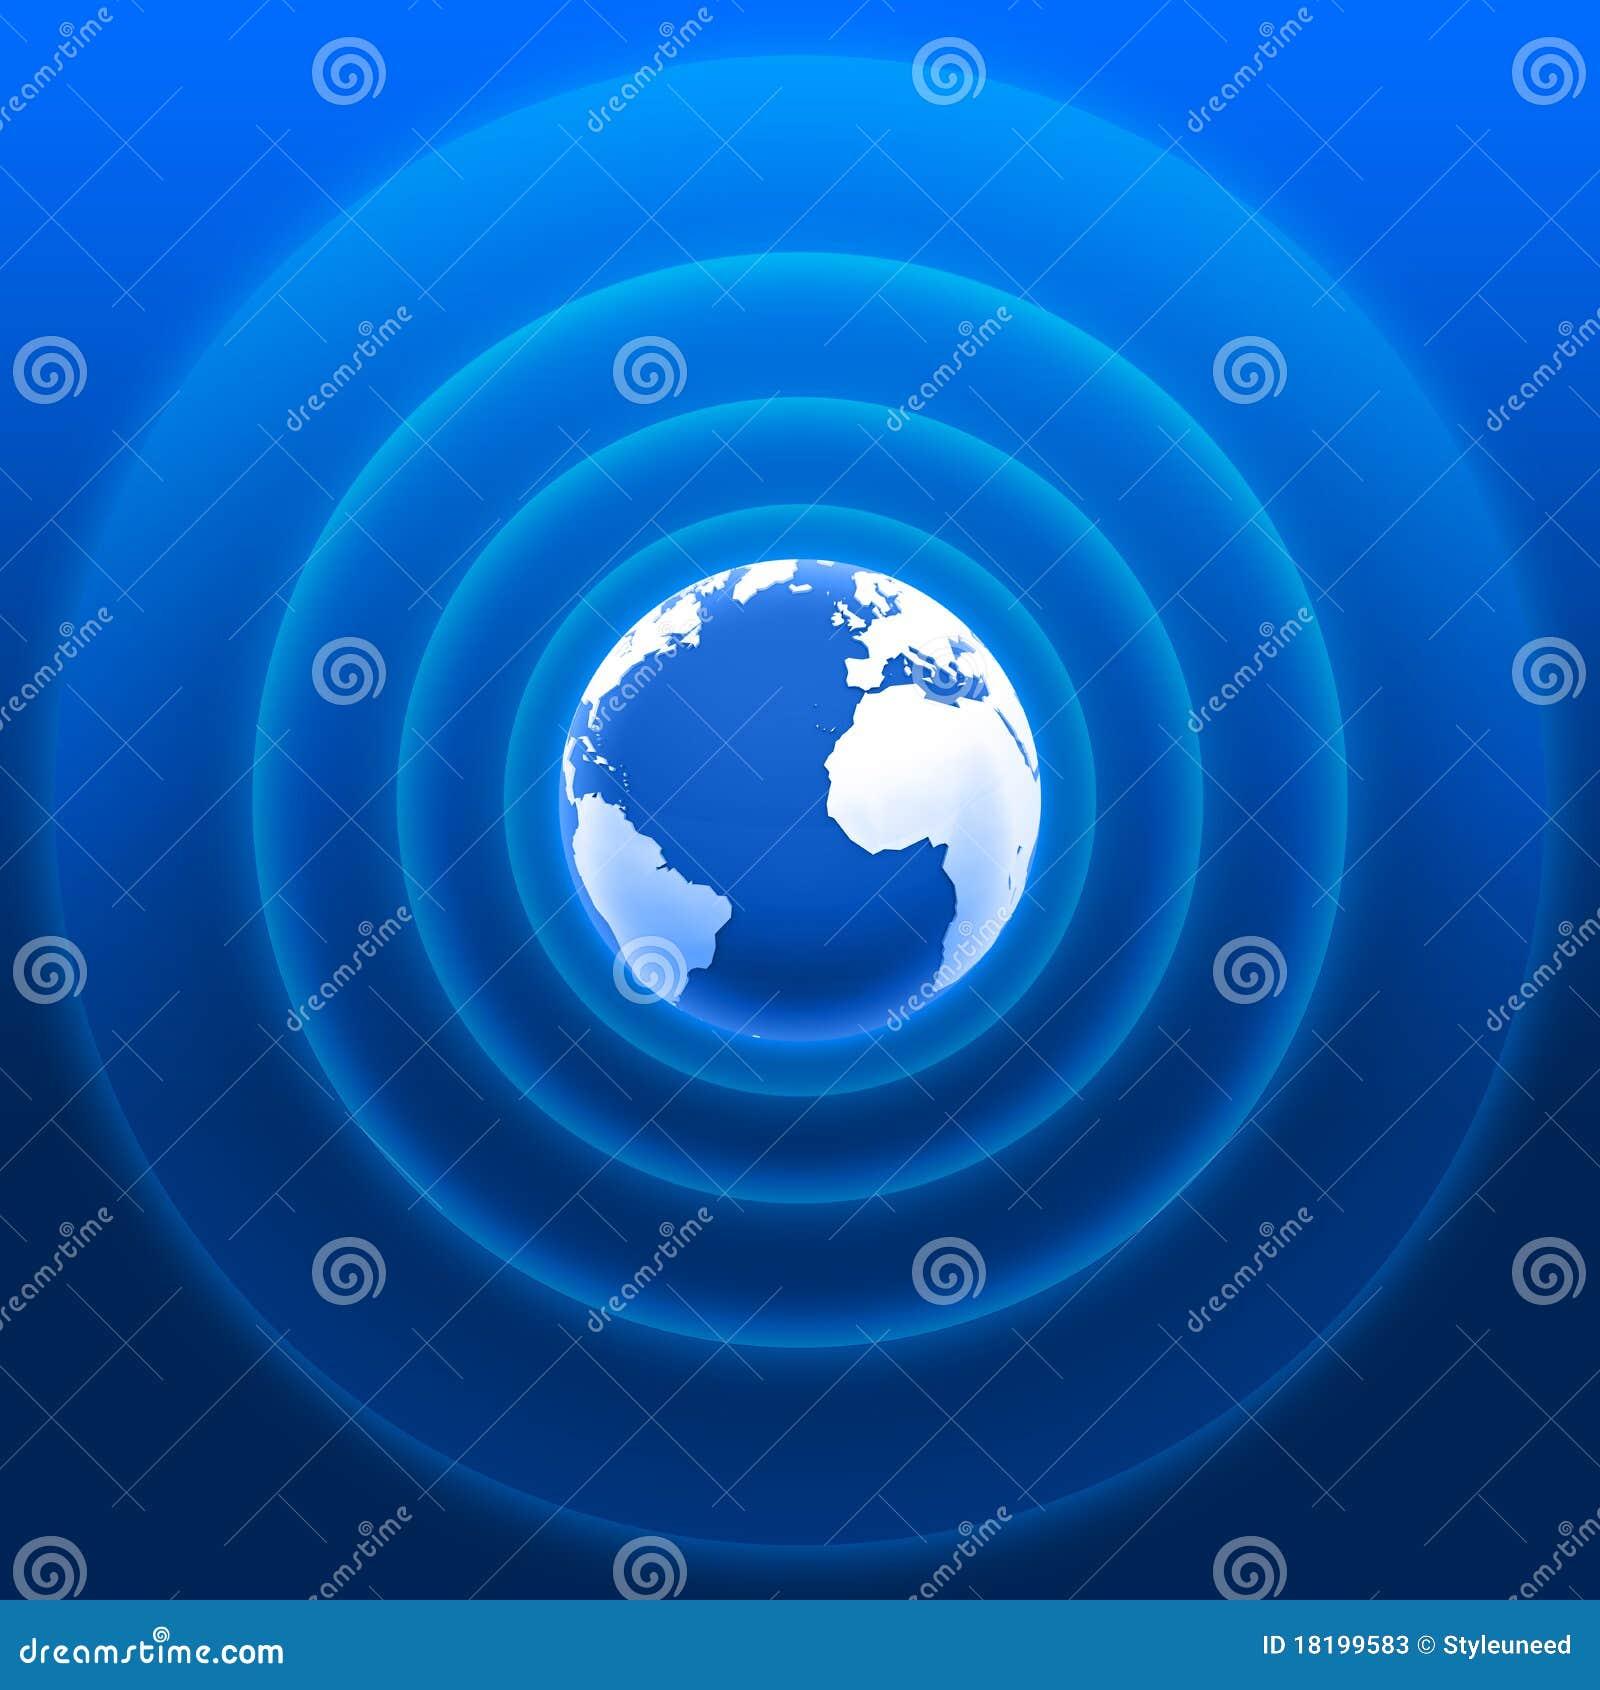 World radar waves blue white 01